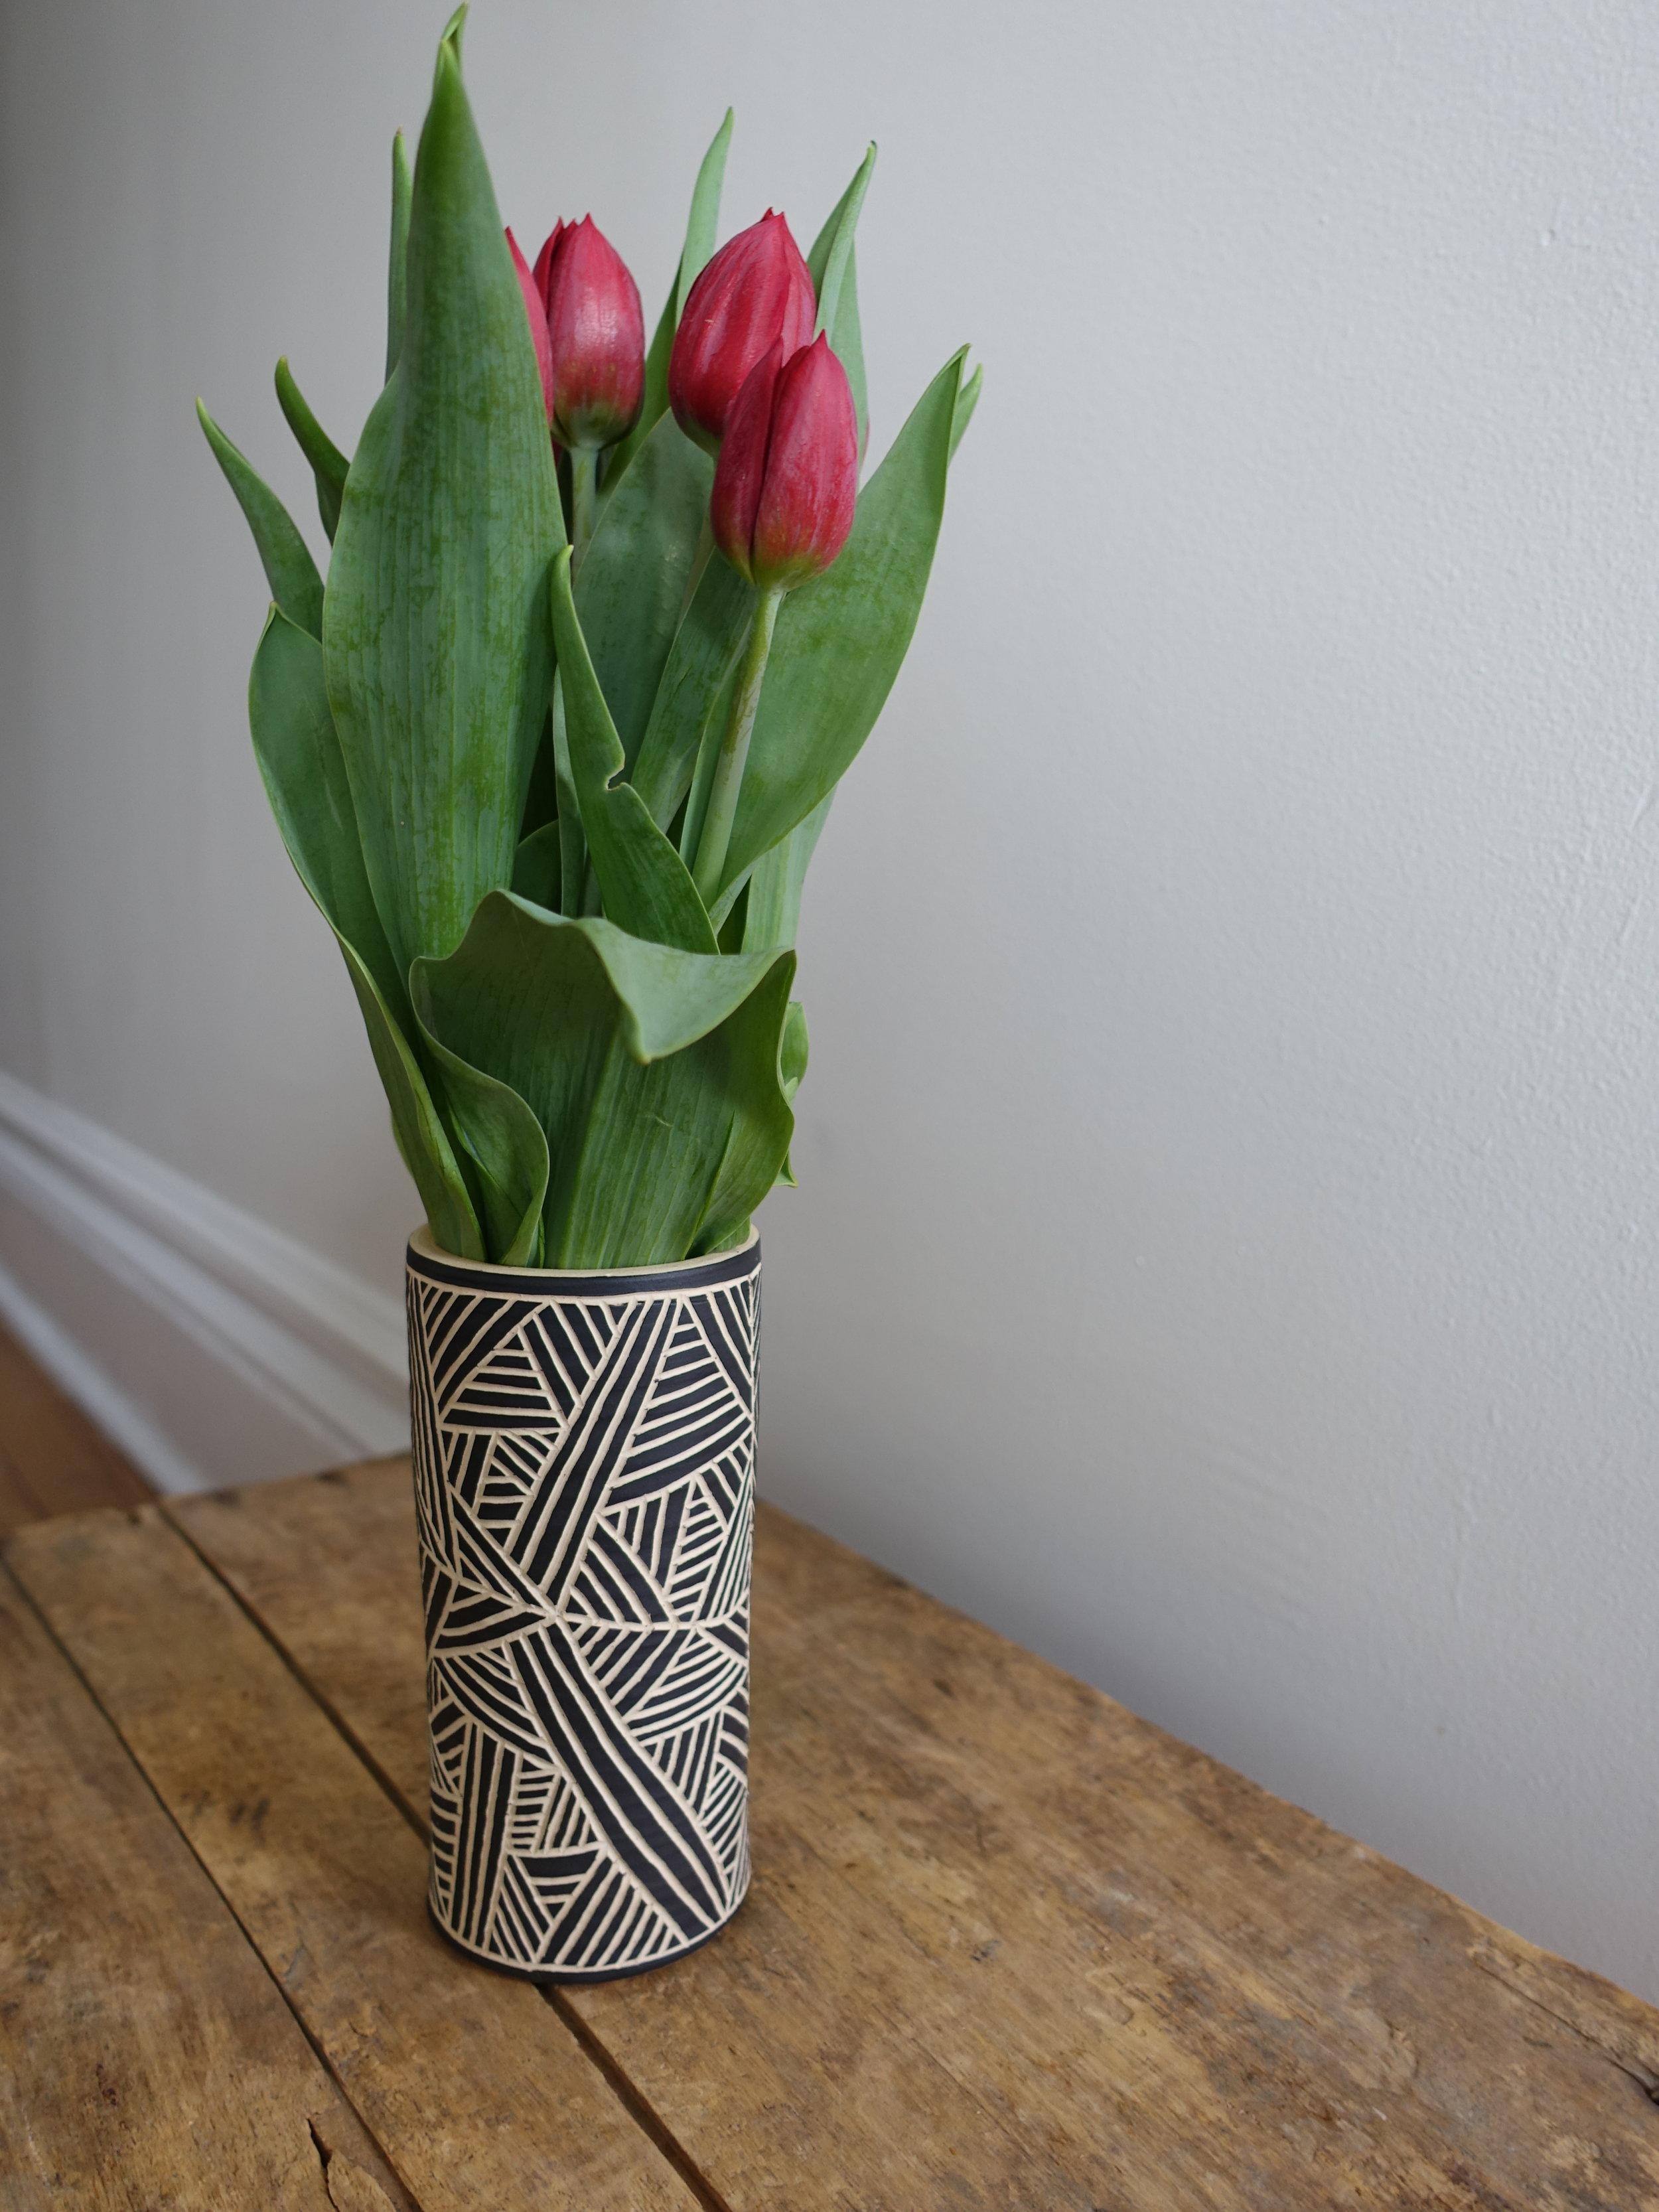 etched vase tulips (1).JPG